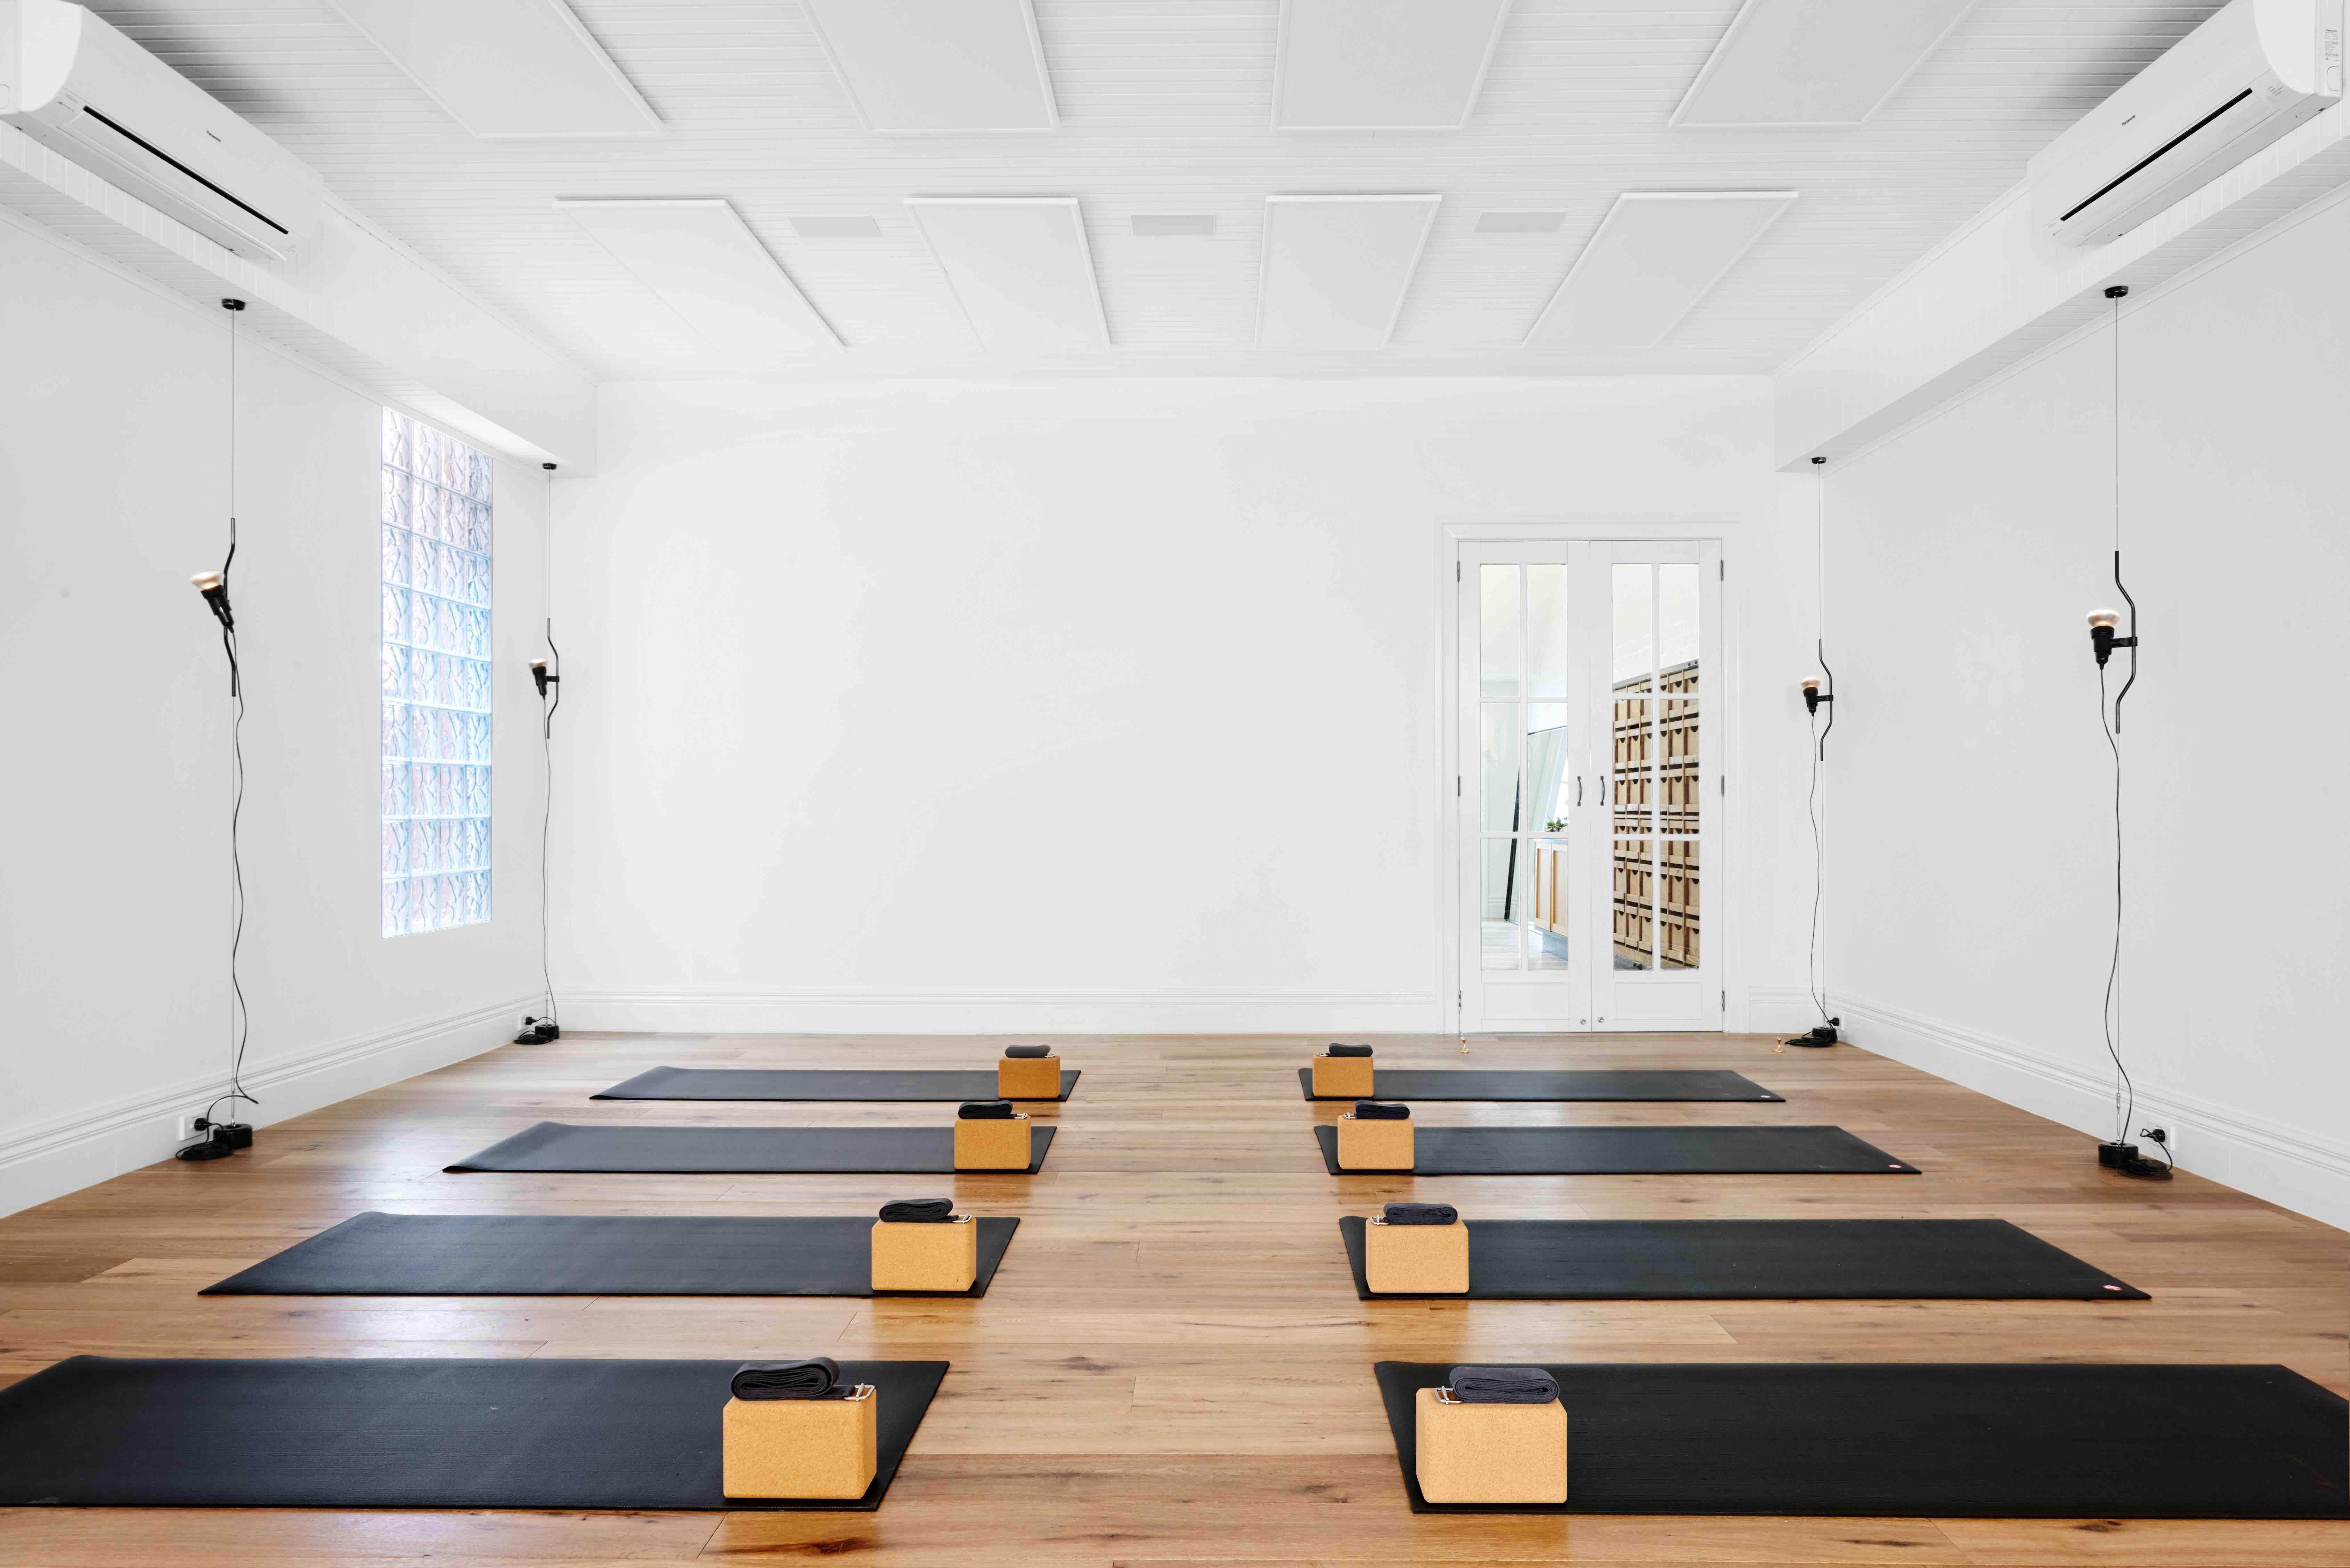 Beautiful Image Of Home Yoga Studio Design Ideas Interior Design Ideas Home Decorating Inspiration Moercar Home Yoga Room Yoga Studio Design Yoga Studio Home